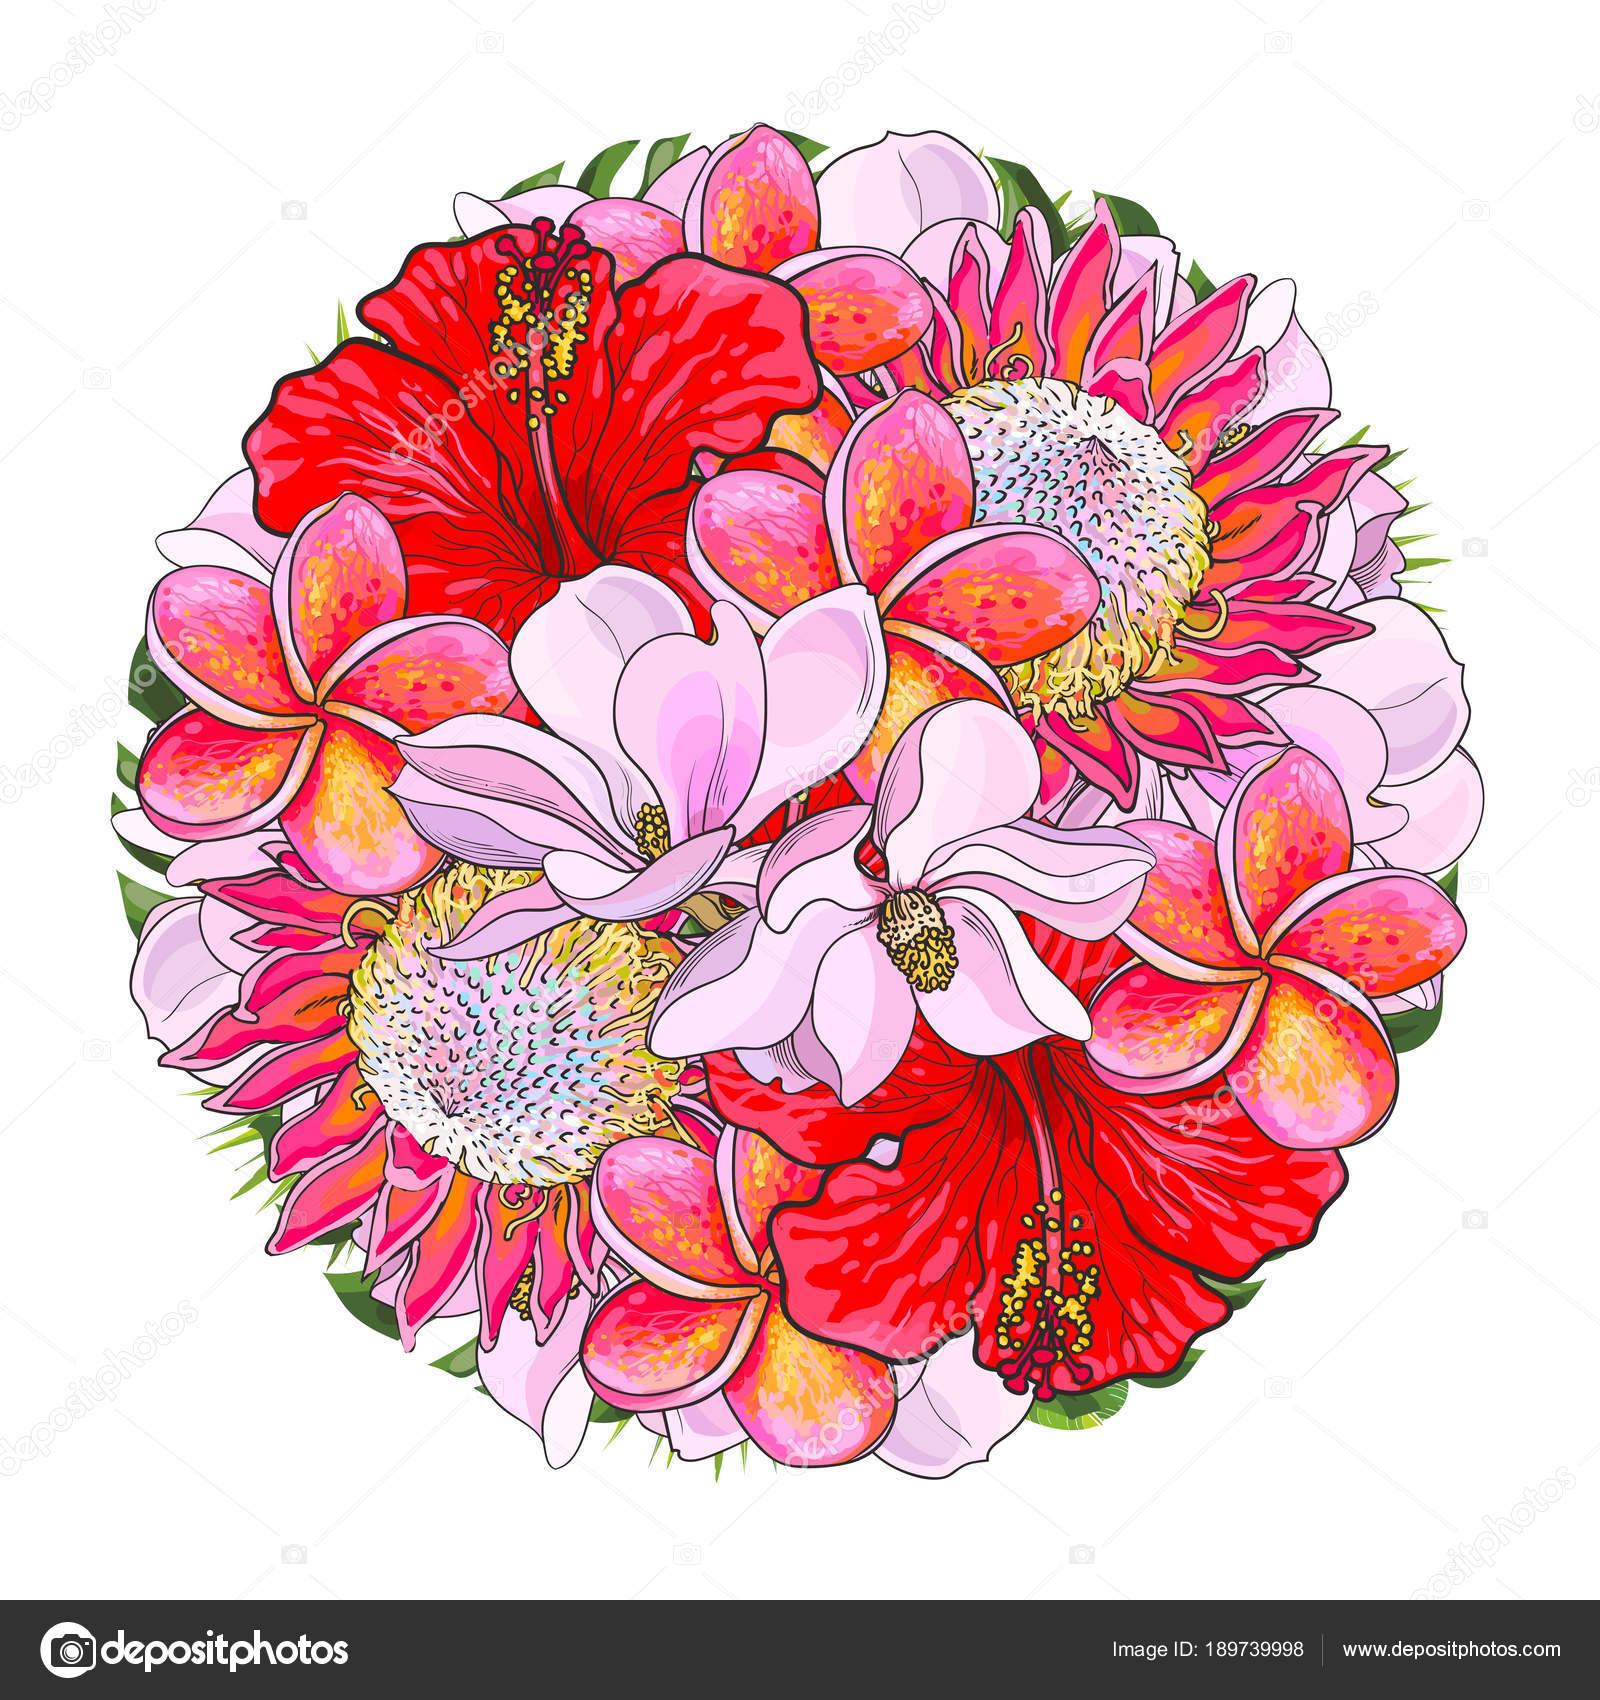 Tropical flowers in bouquet of sphere shape isolated on white tropical flowers in bouquet of sphere shape isolated on white background stock vector izmirmasajfo